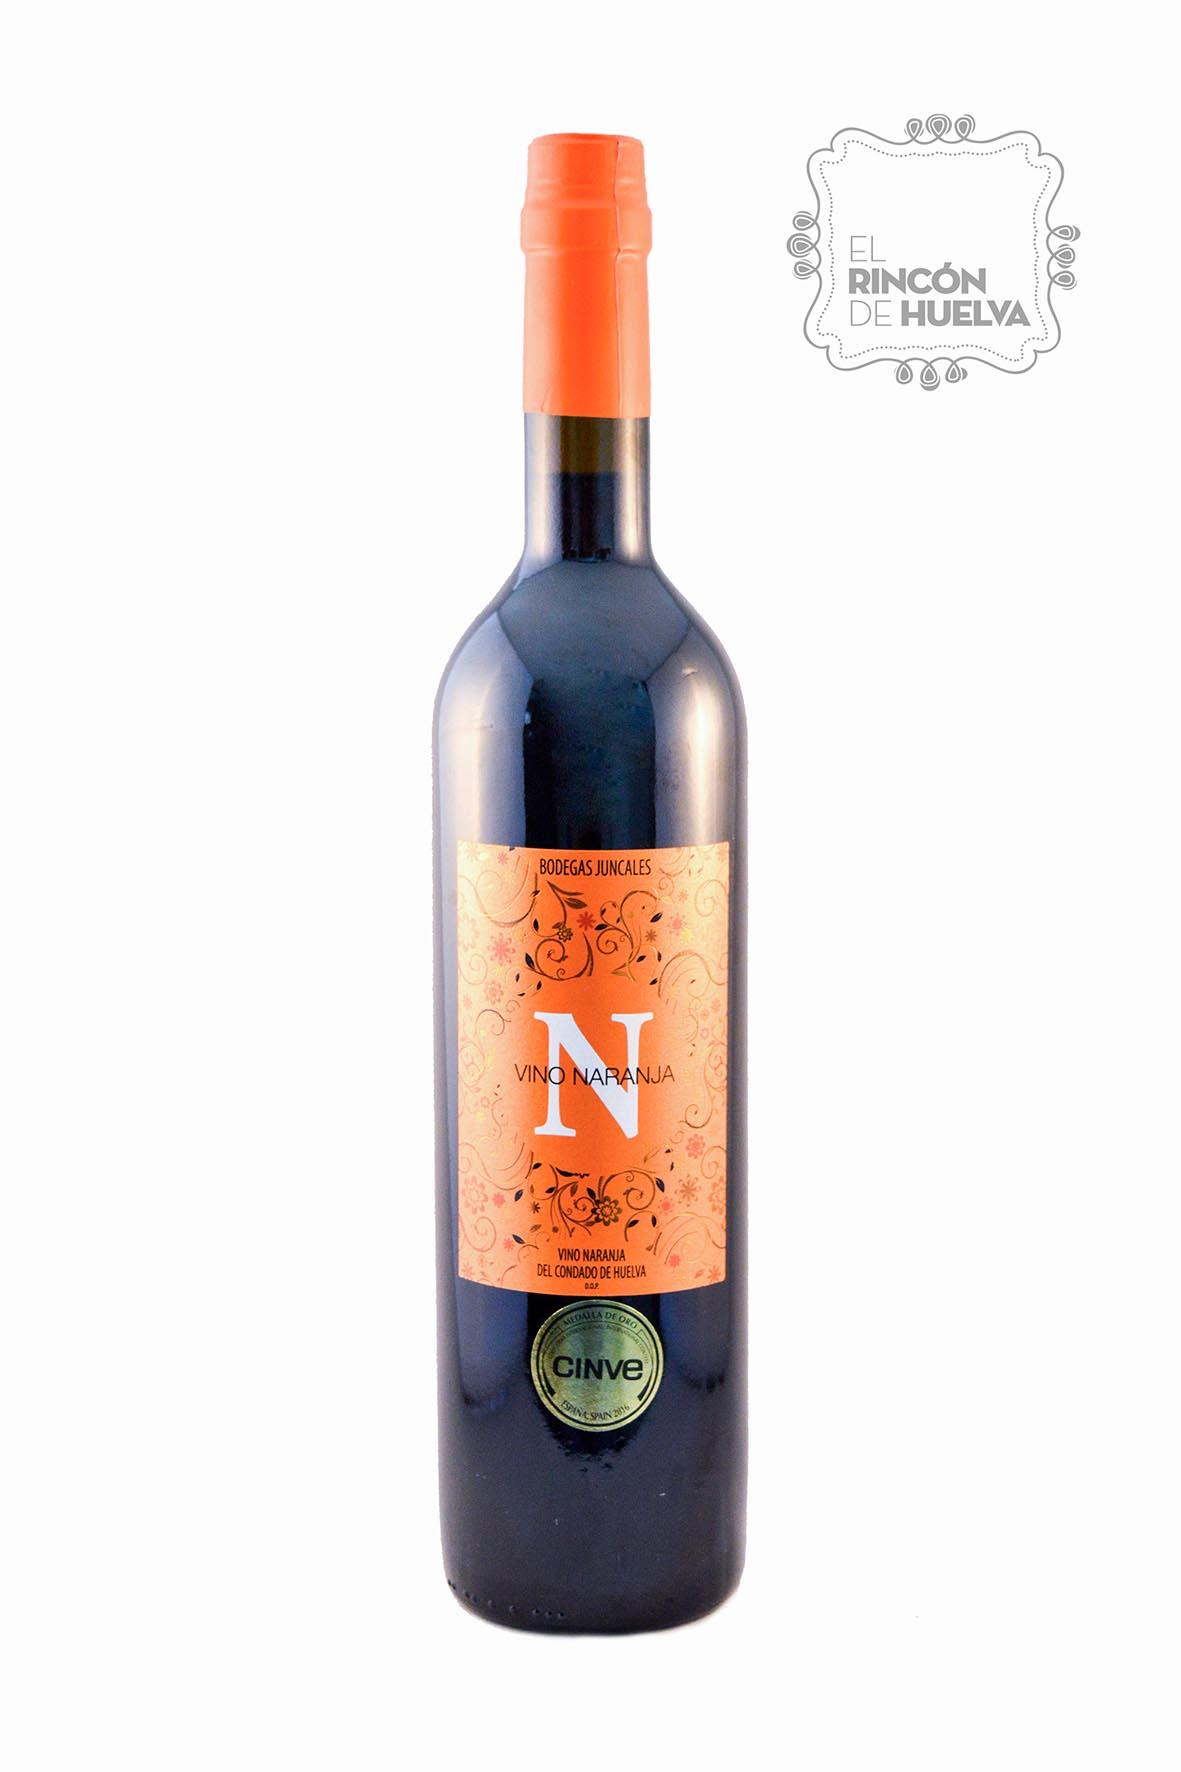 botella de vino de naranja de bodegas juncales